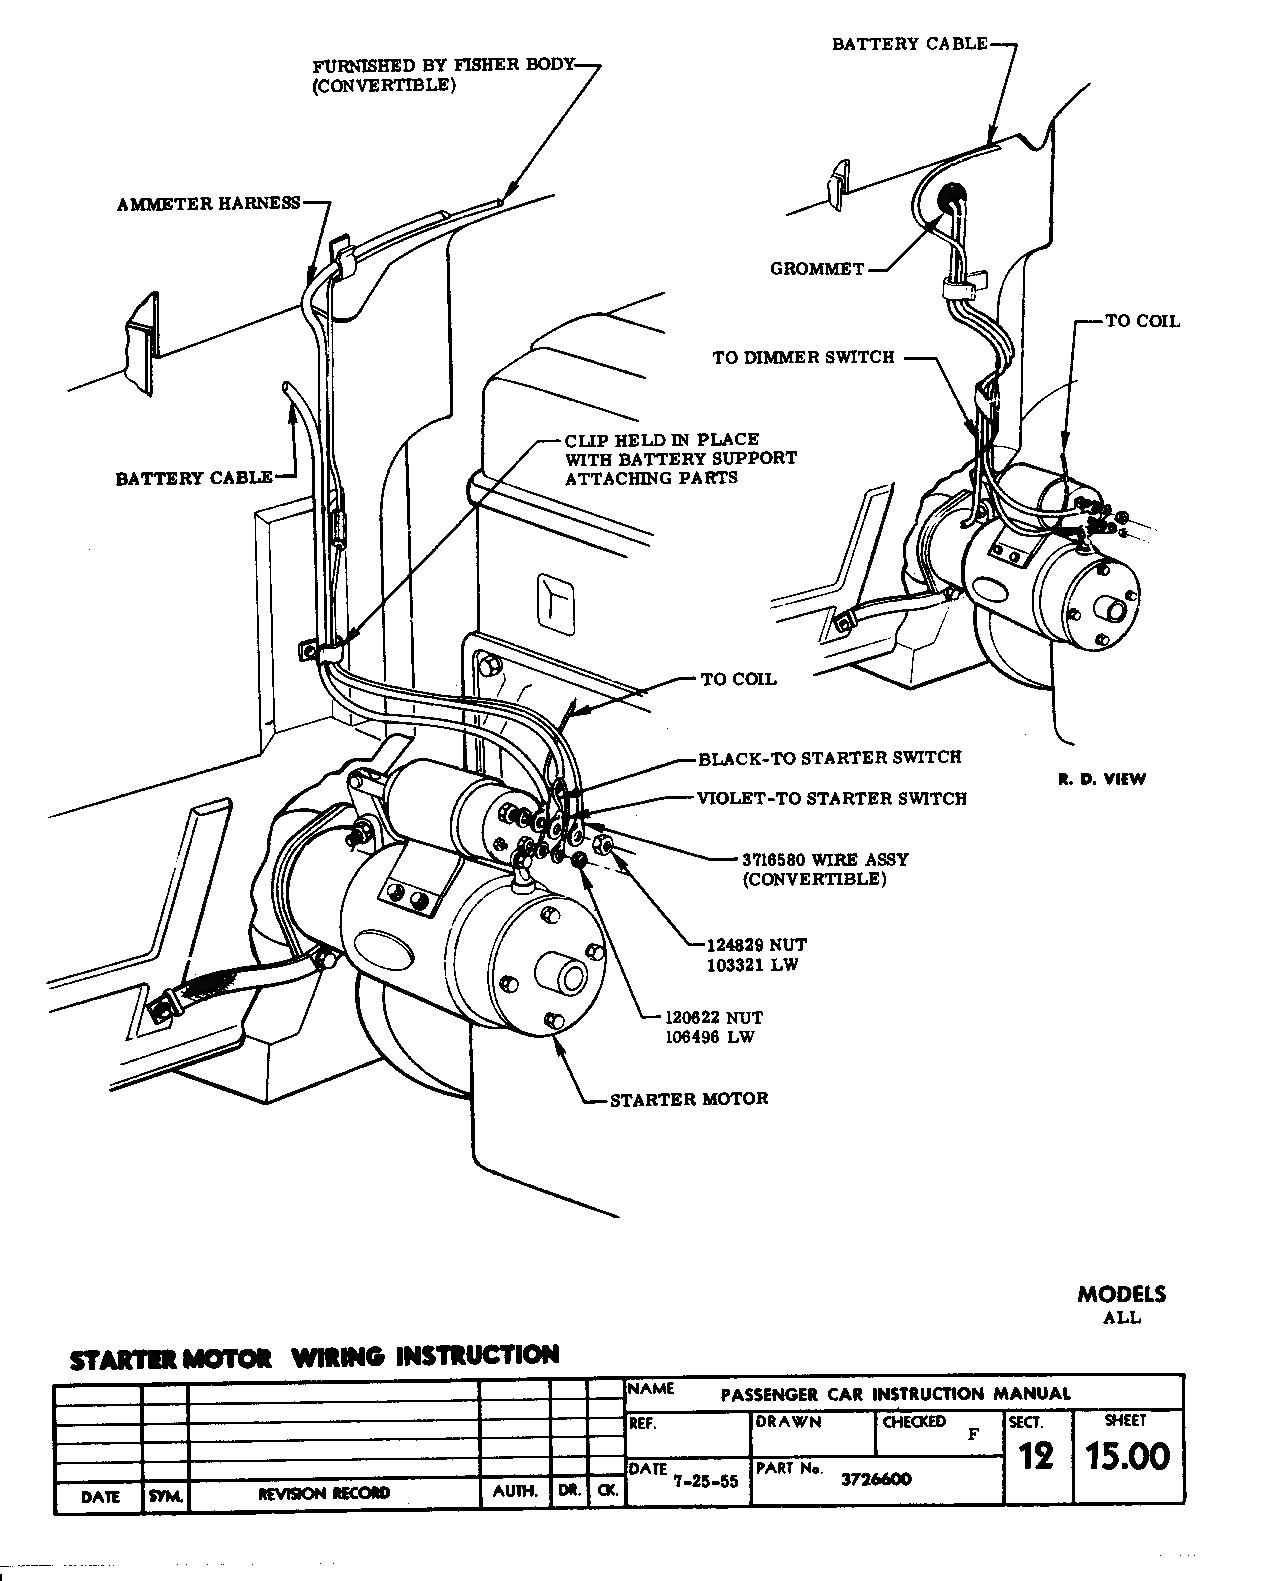 Marine Starter Solenoid Wiring Diagram New Chevy Hei Of 10 8 - Hei Wiring Diagram